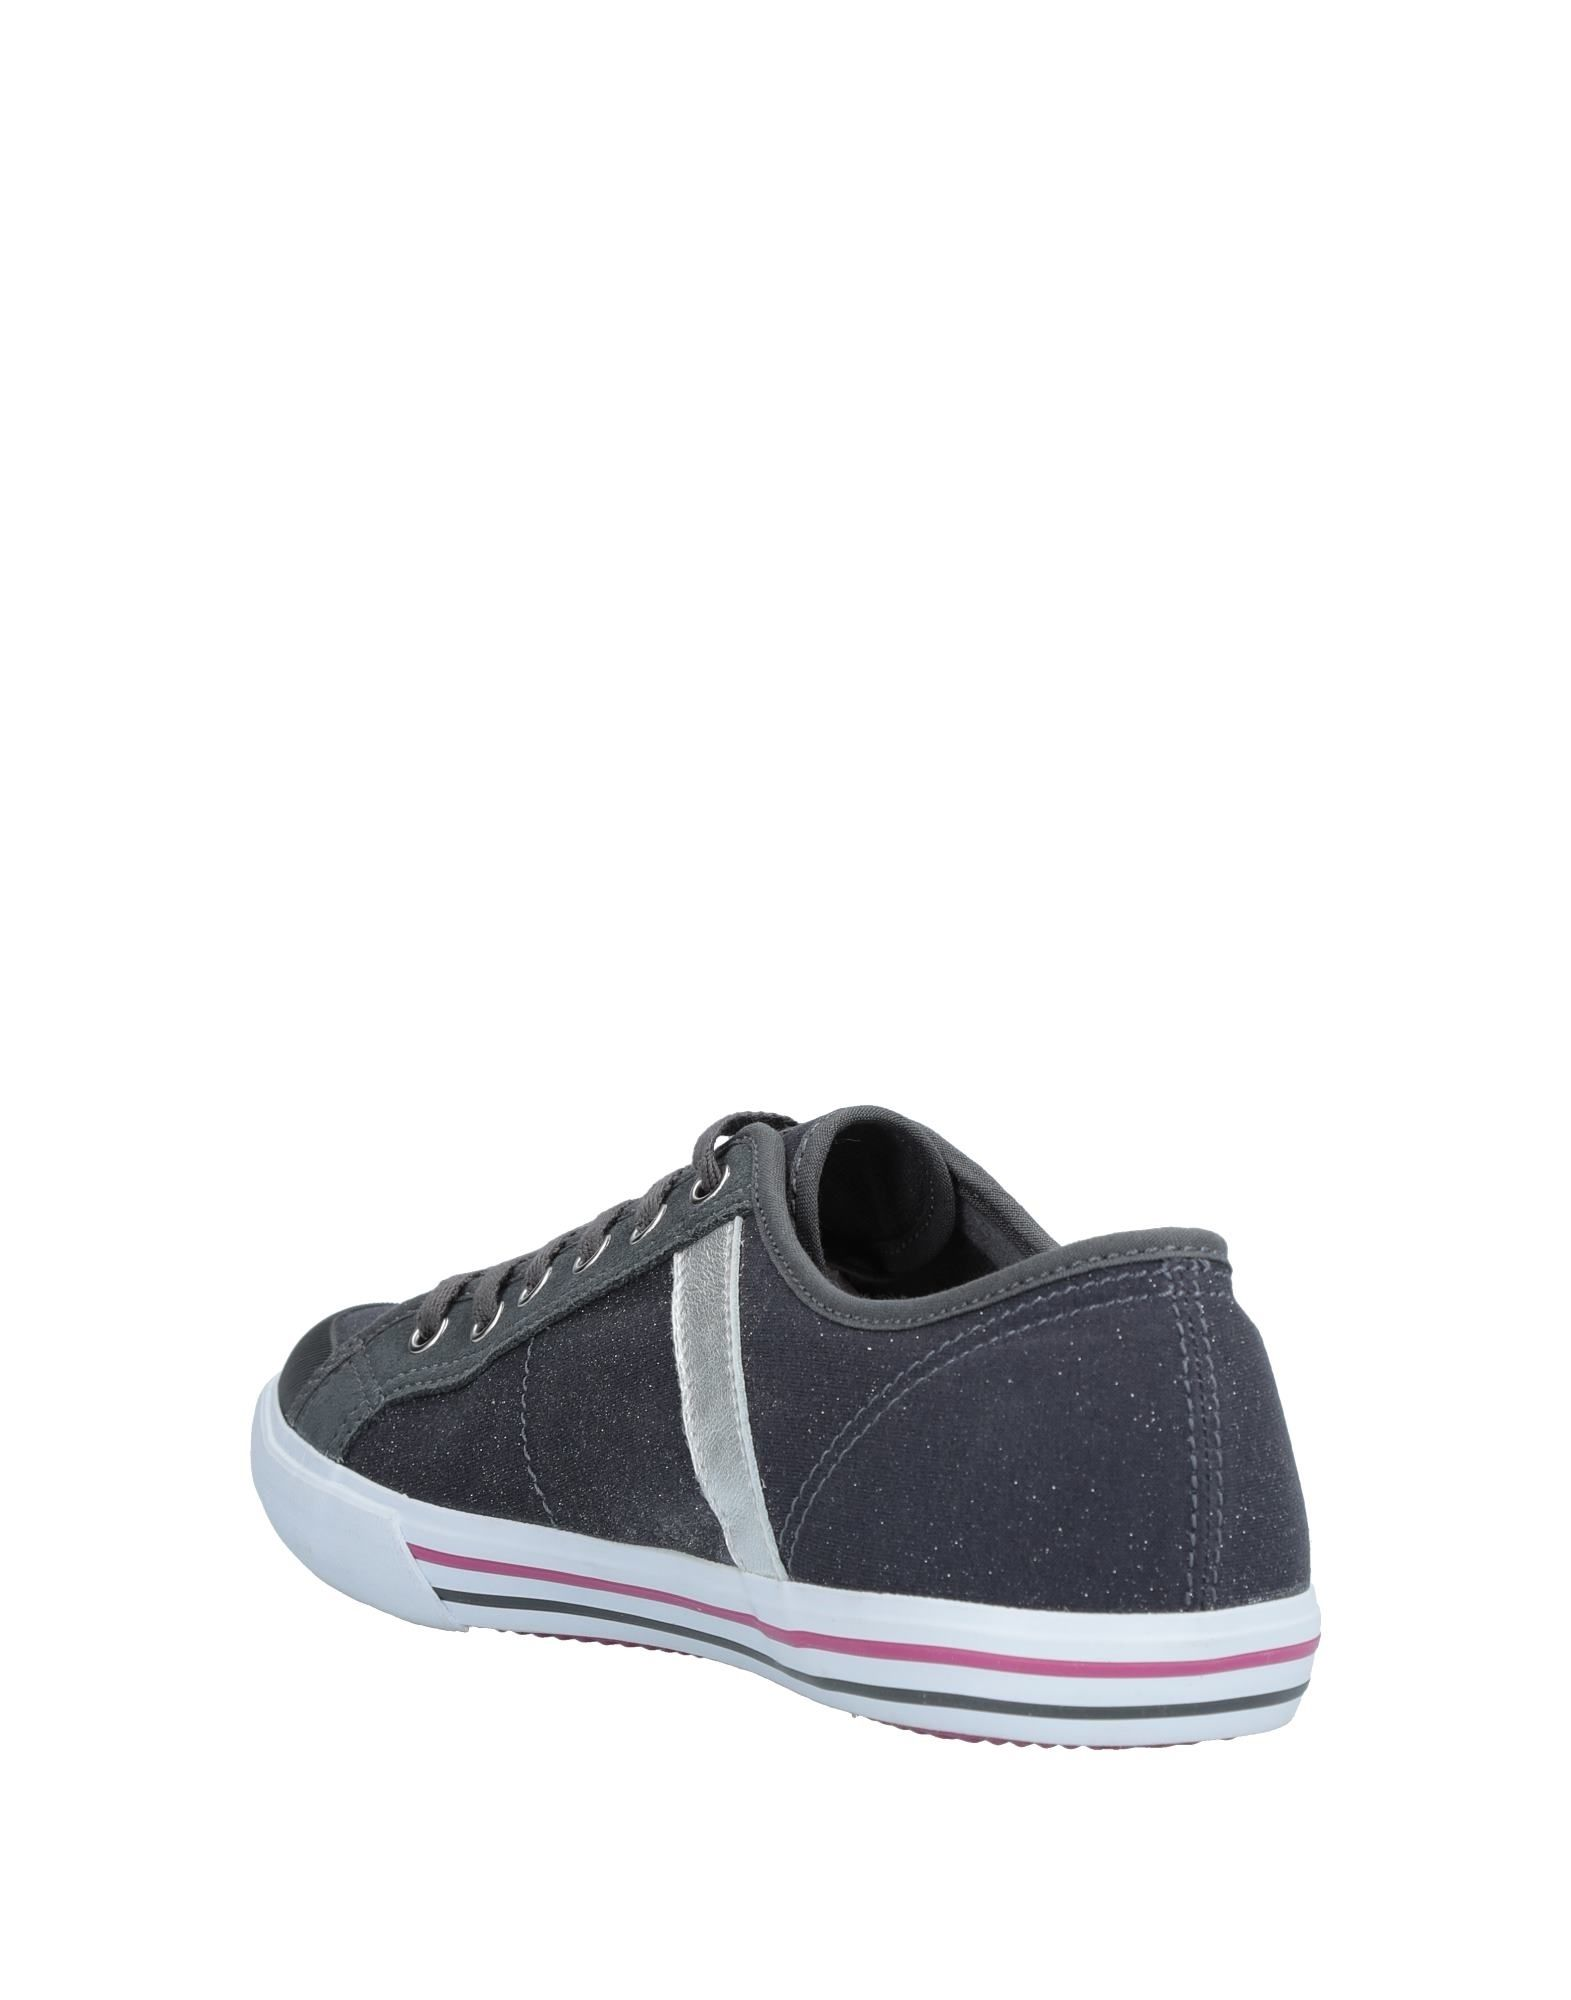 Le Coq Sportif Sneakers Damen beliebte  11534491GX Gute Qualität beliebte Damen Schuhe 5038a1